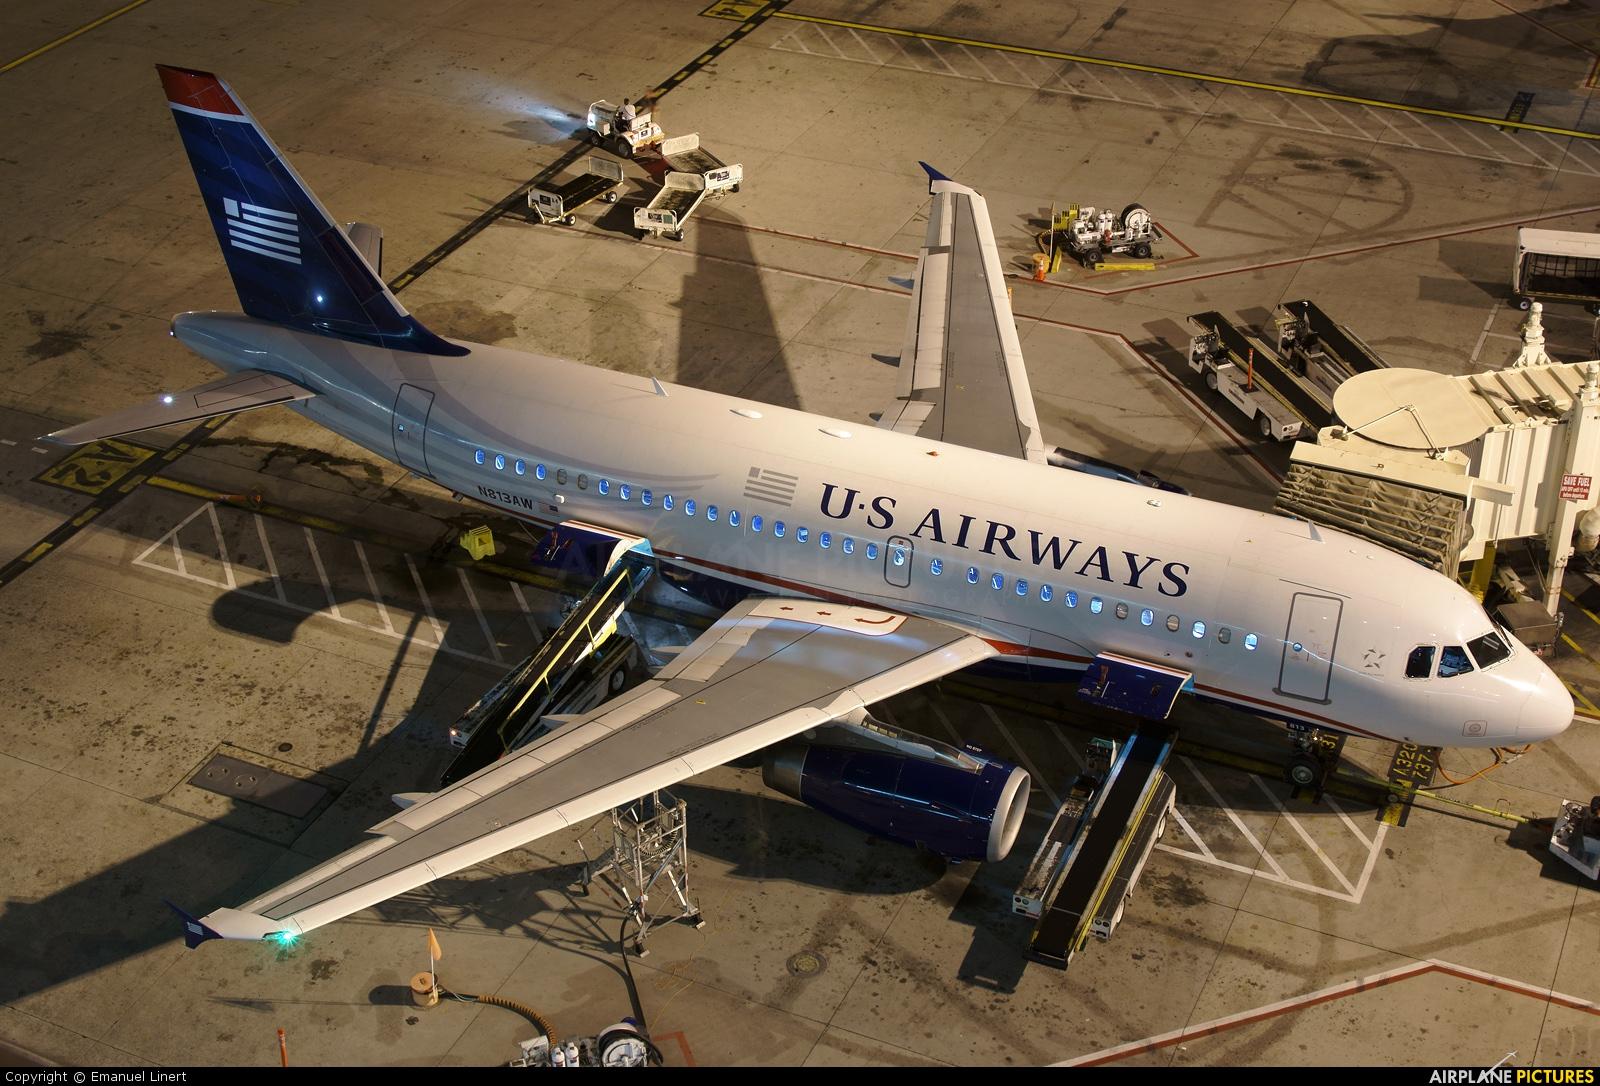 US Airways N813AW aircraft at Phoenix - Sky Harbor Intl